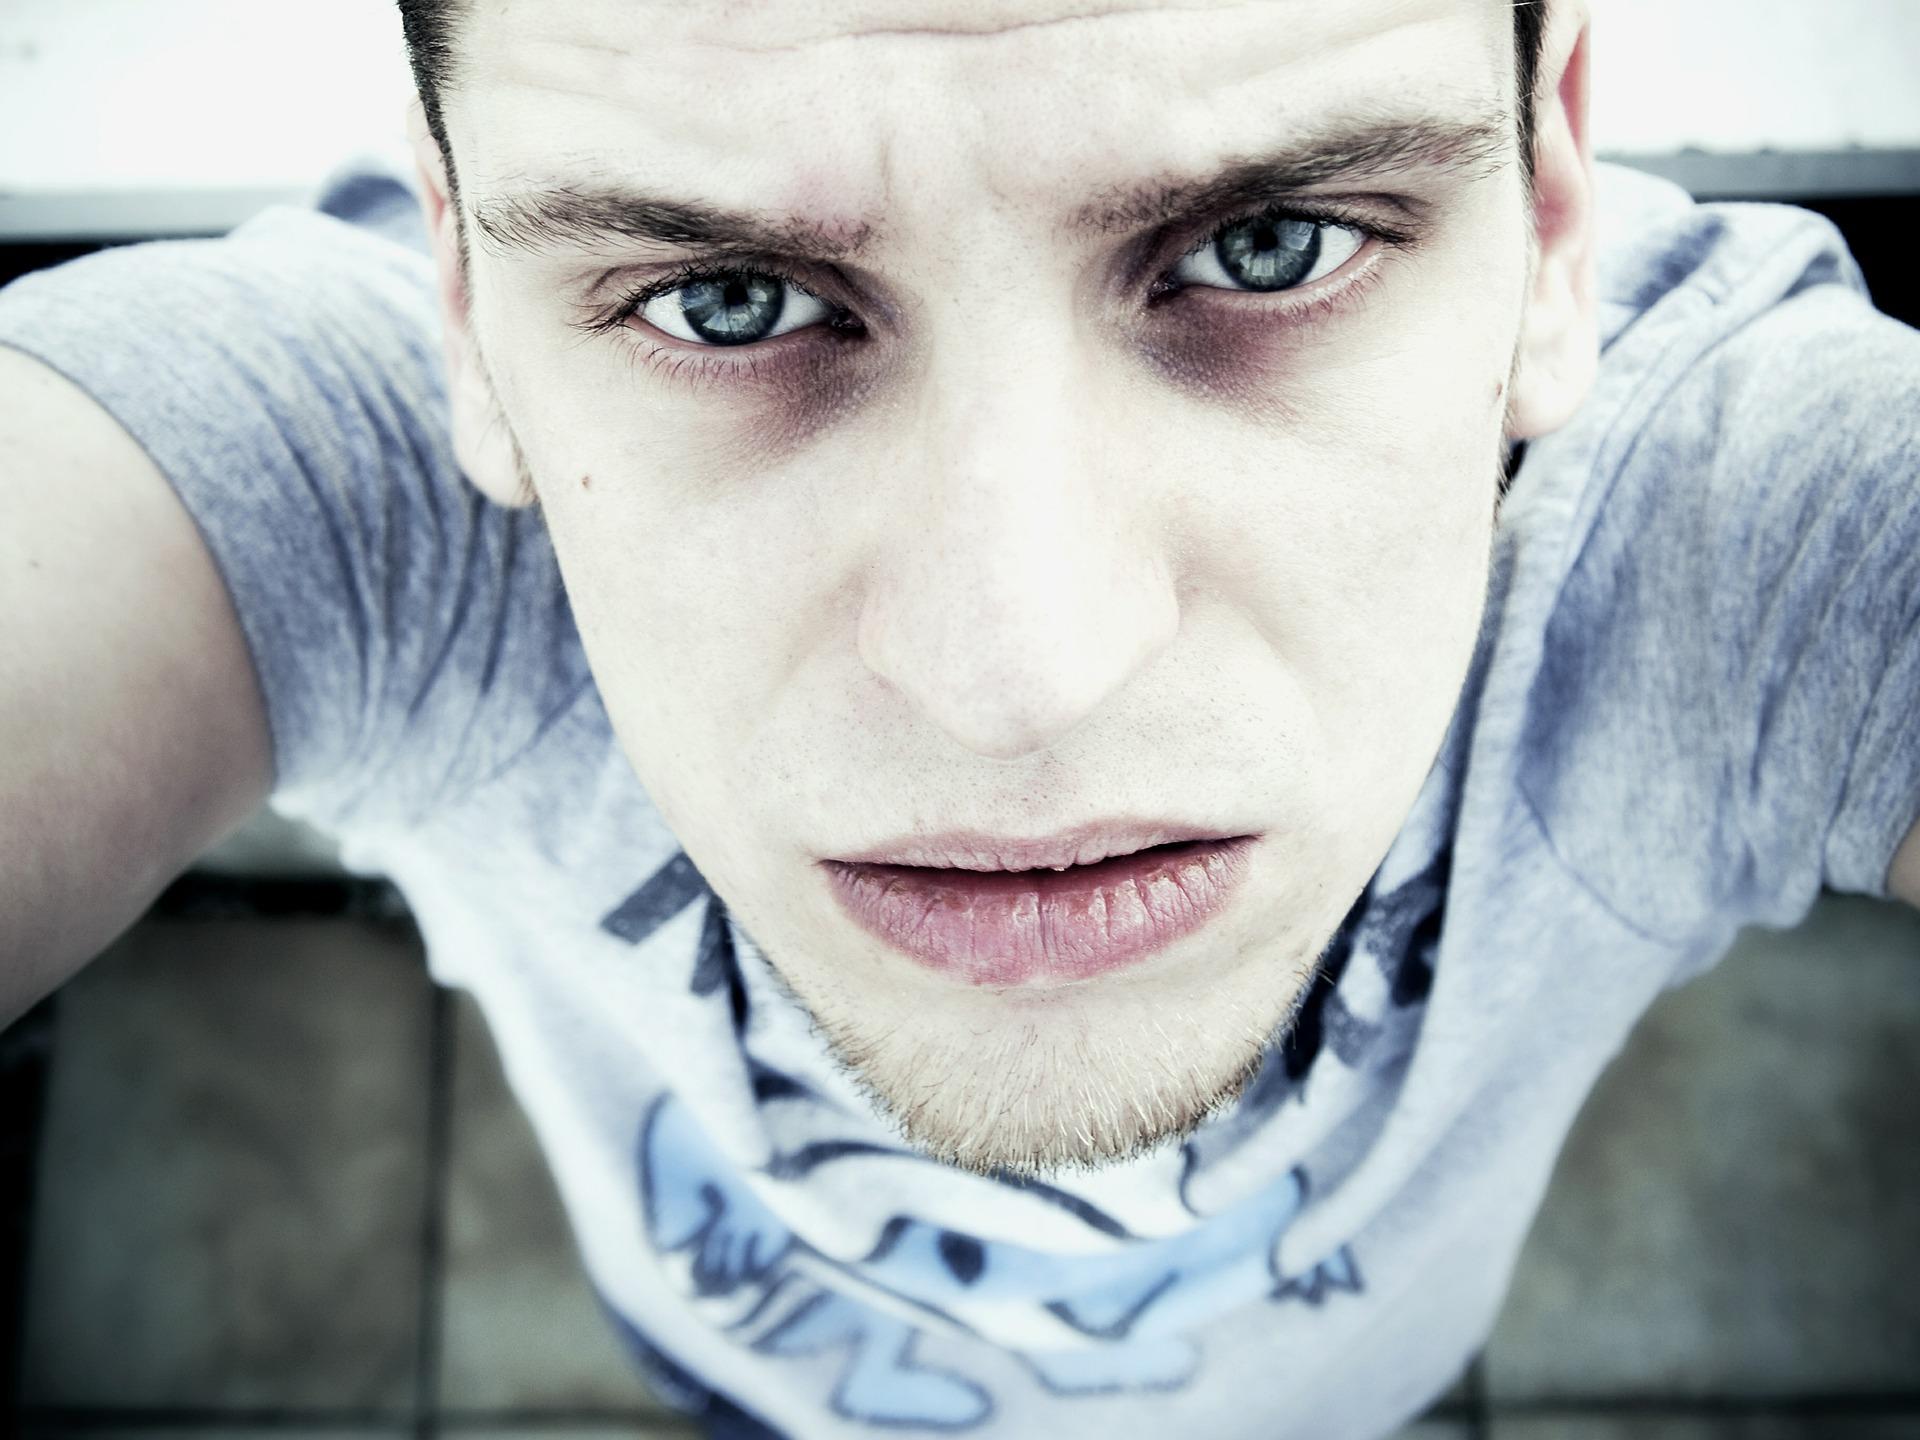 Selfie looking down at man with pale skin